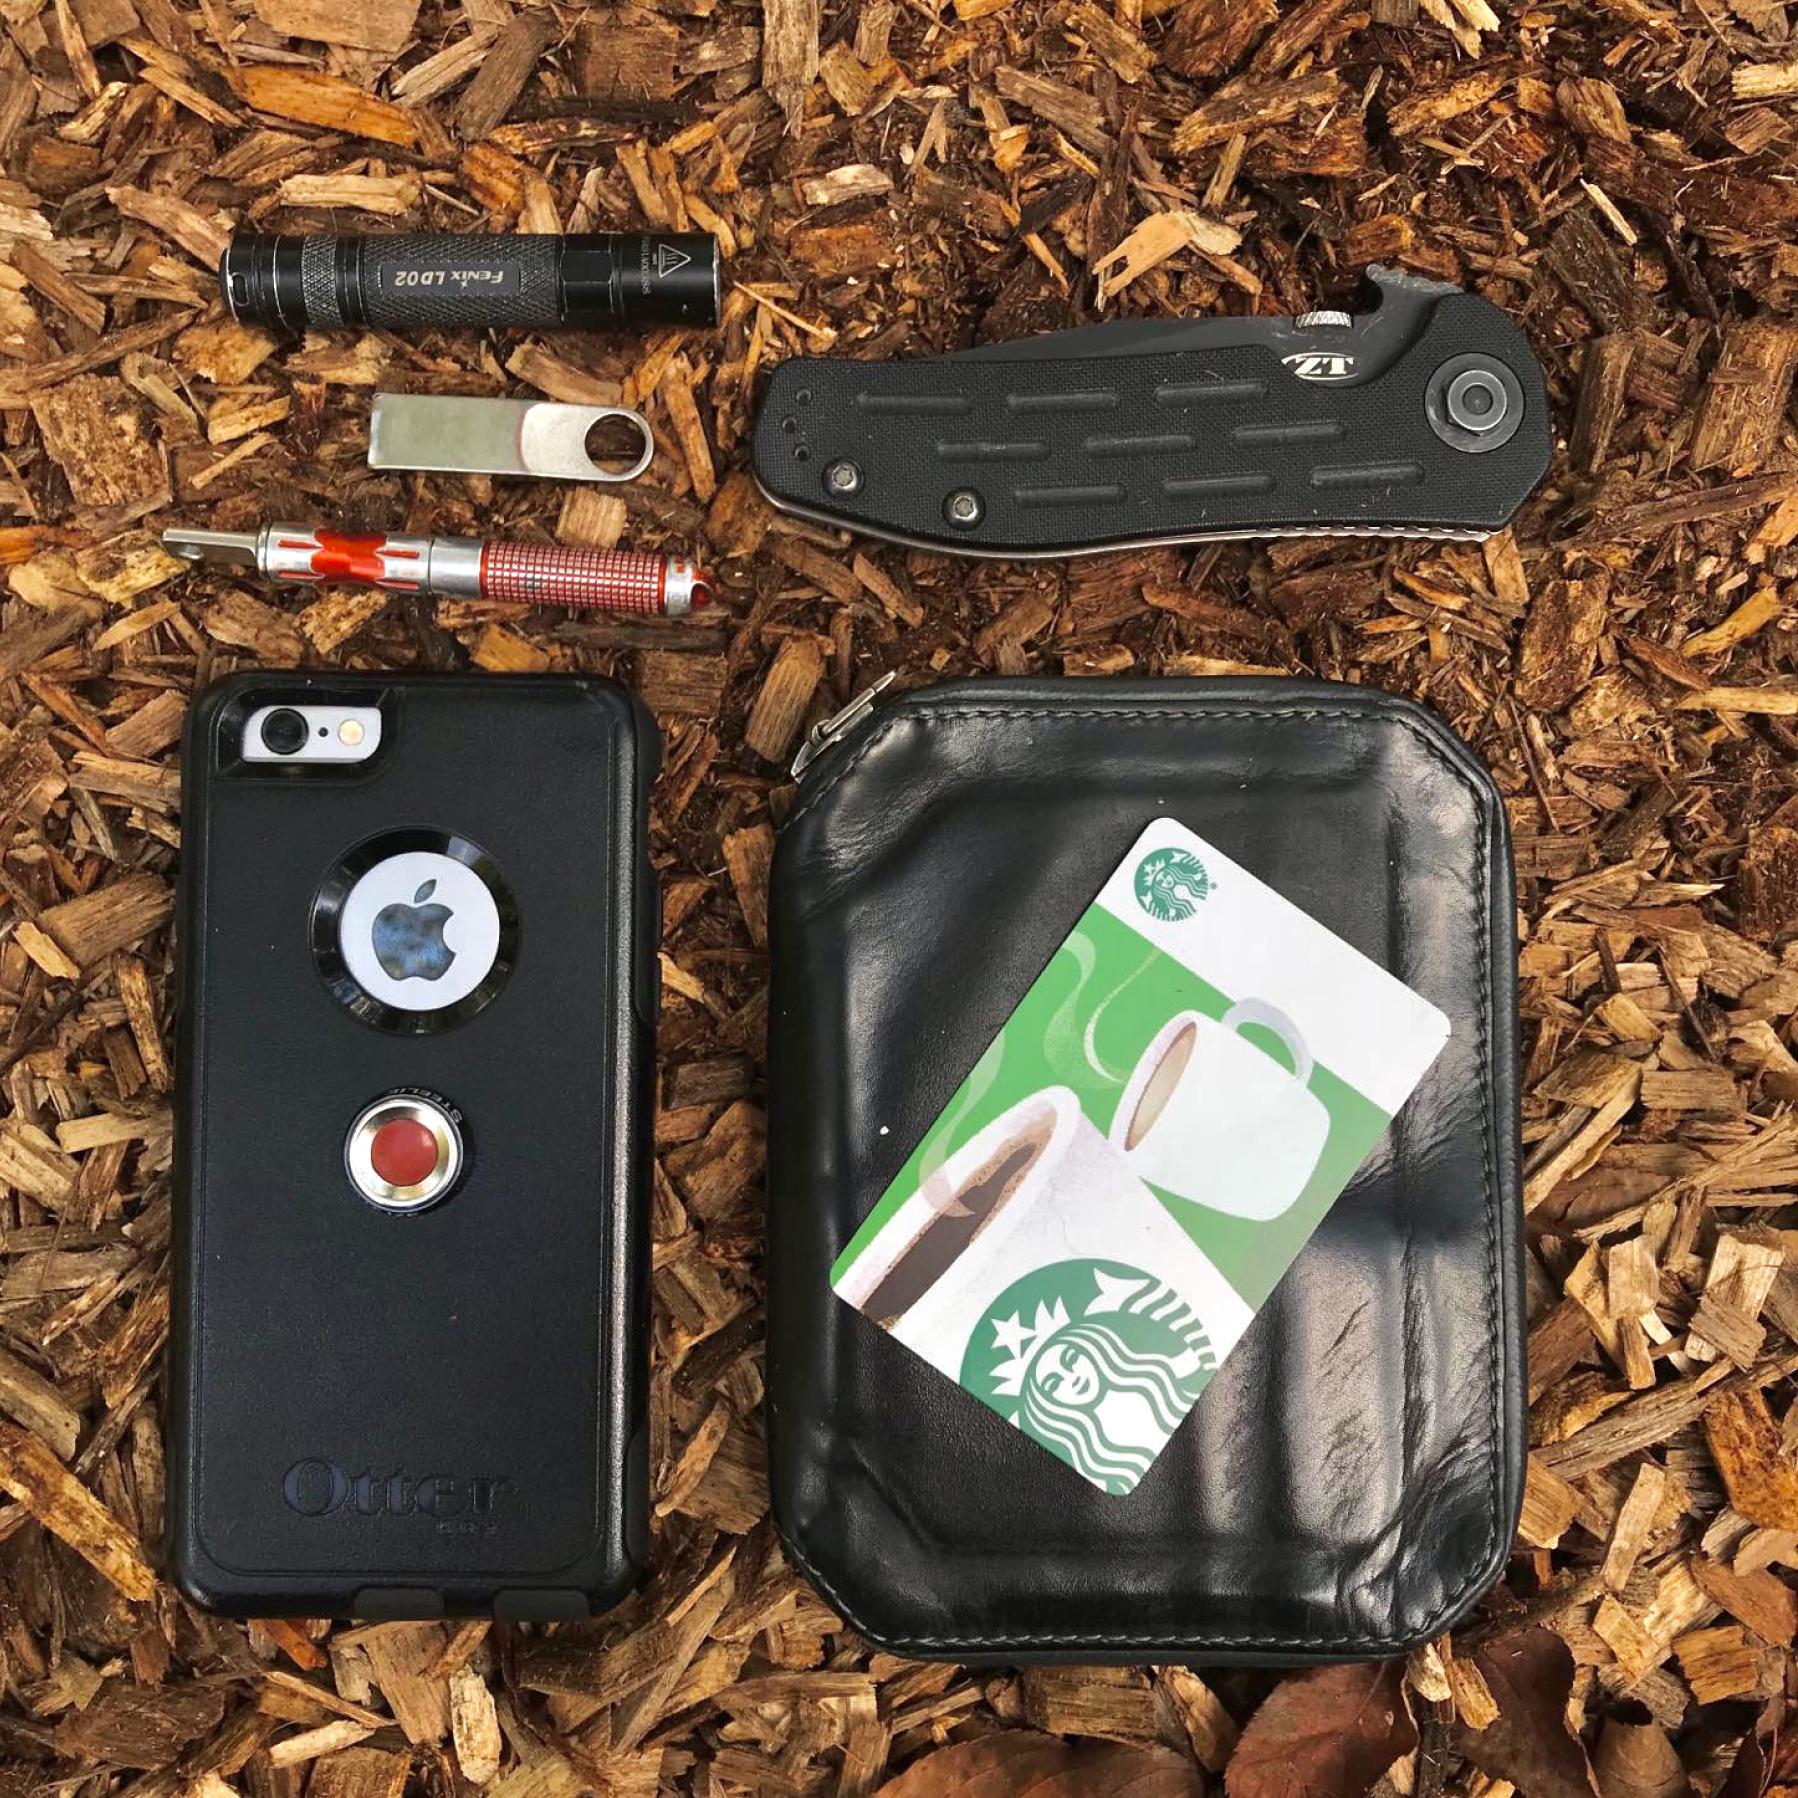 Justin's EDC items (minus handgun and belt).